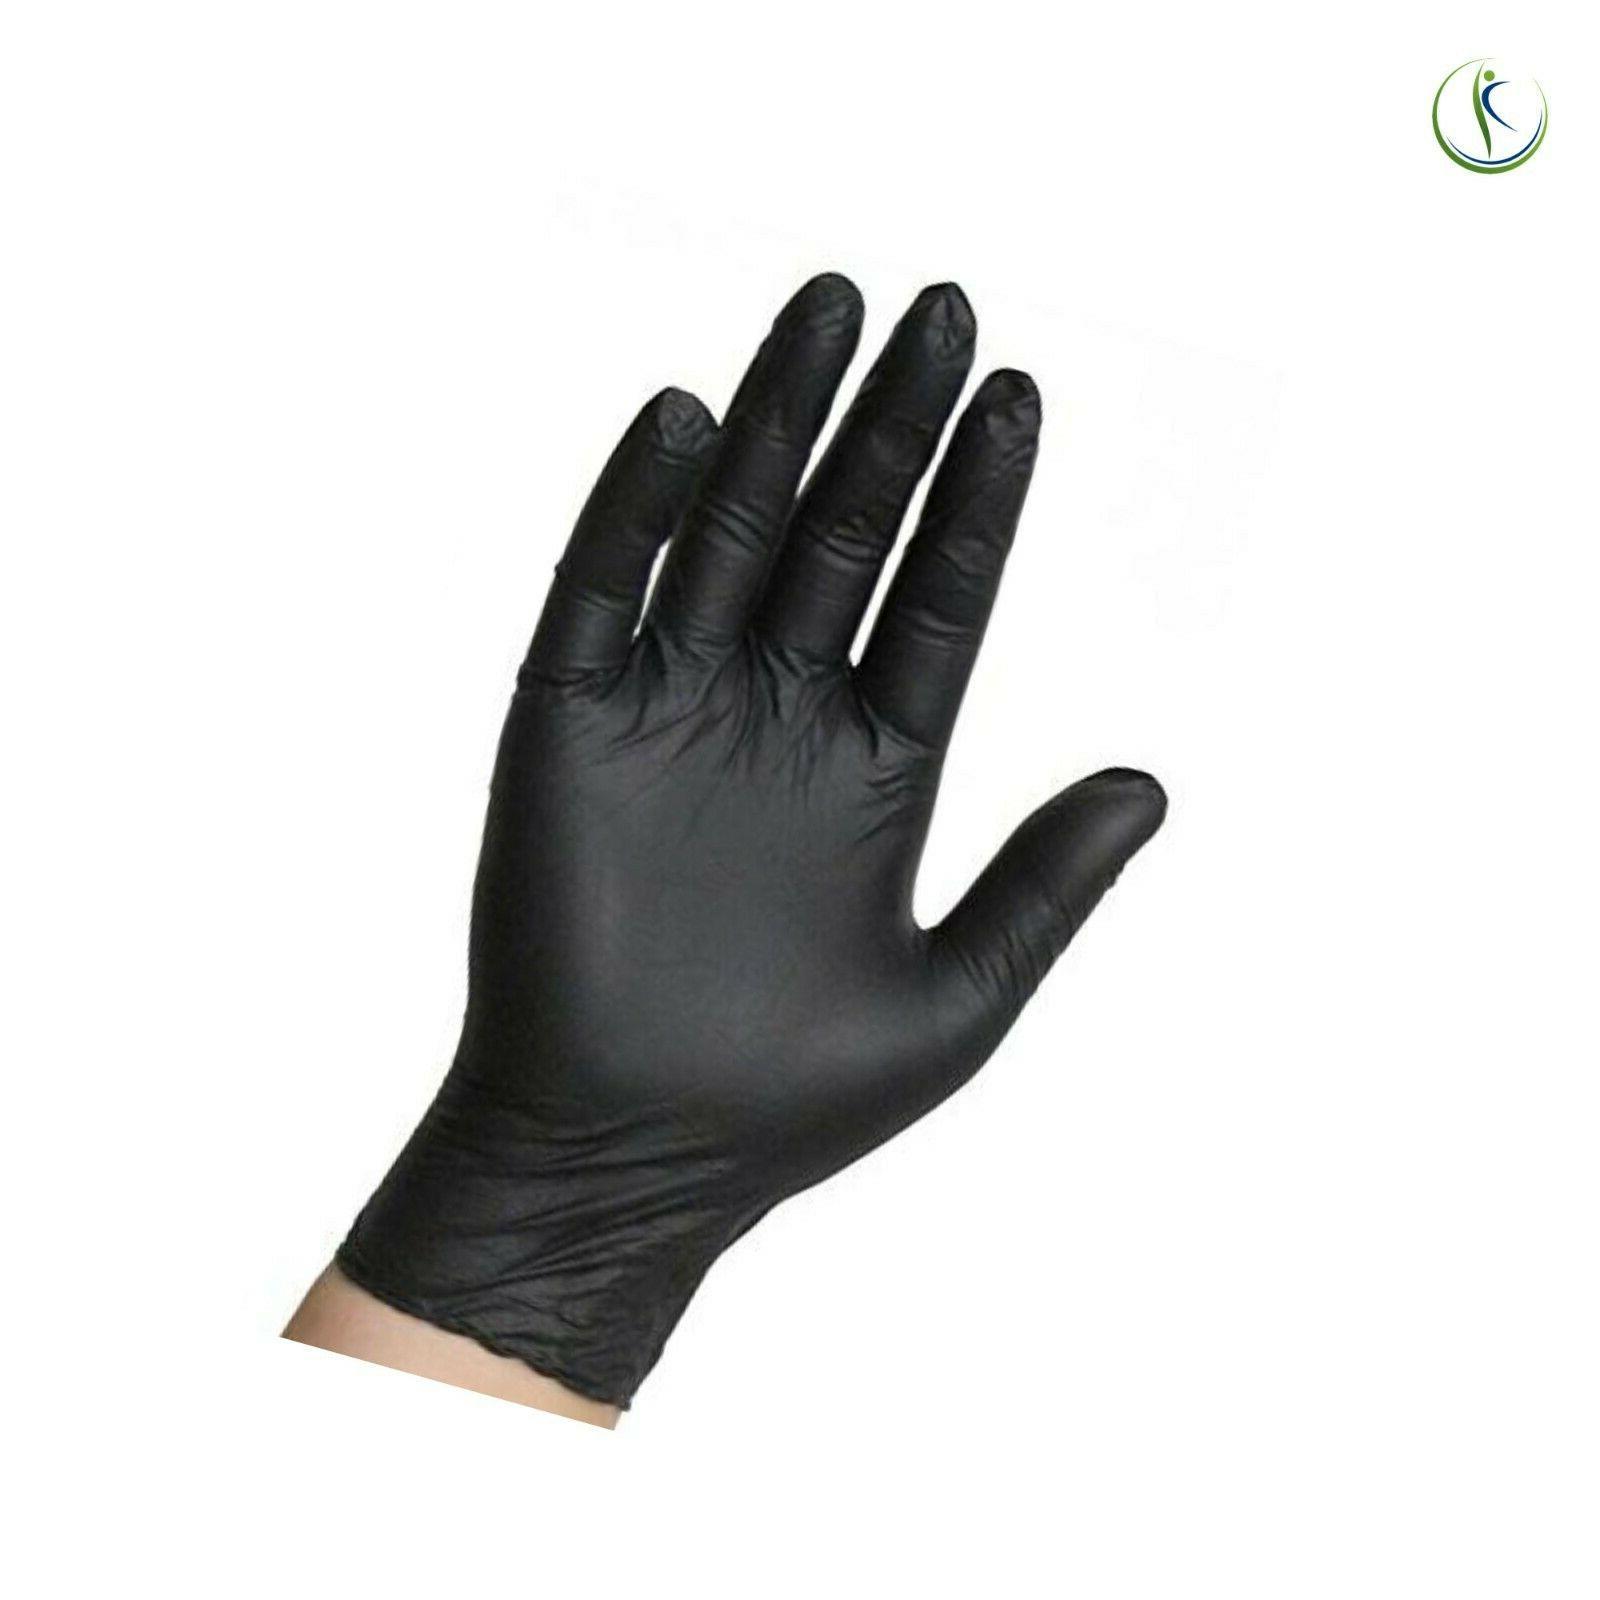 Nitrile Disposable Gloves Powder-Free 5 Mil